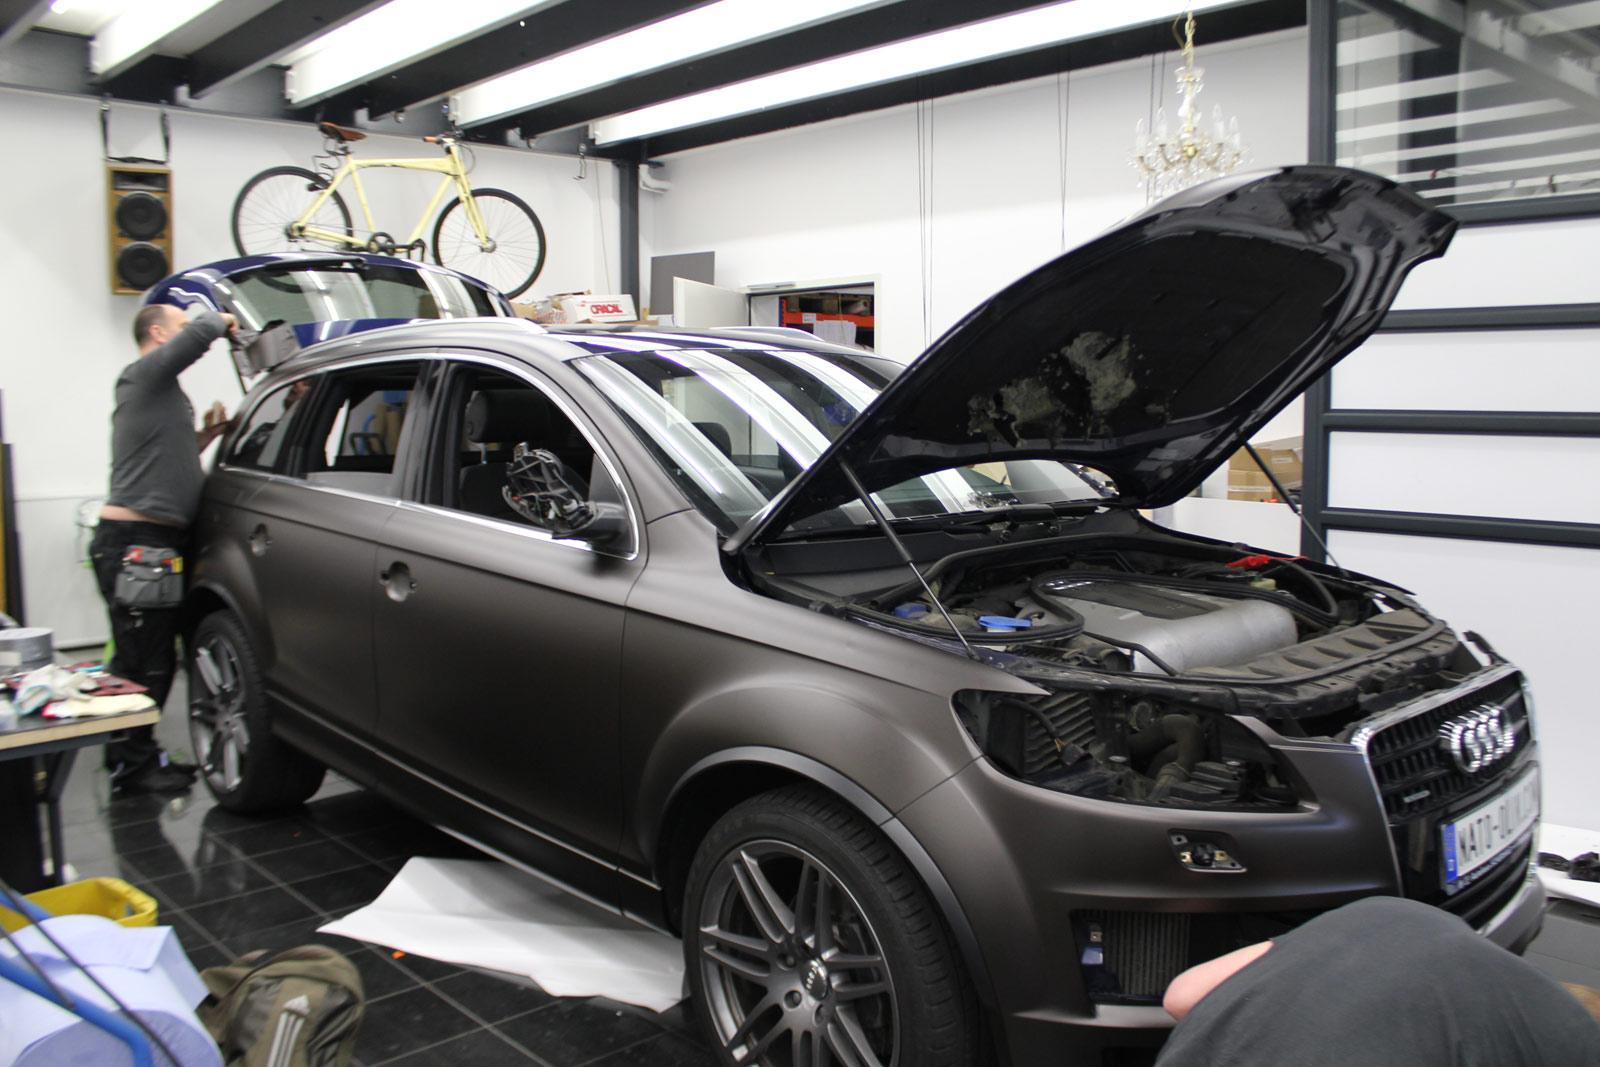 Audi_Q7_Folierung_Braun_Matt_Metallic_10